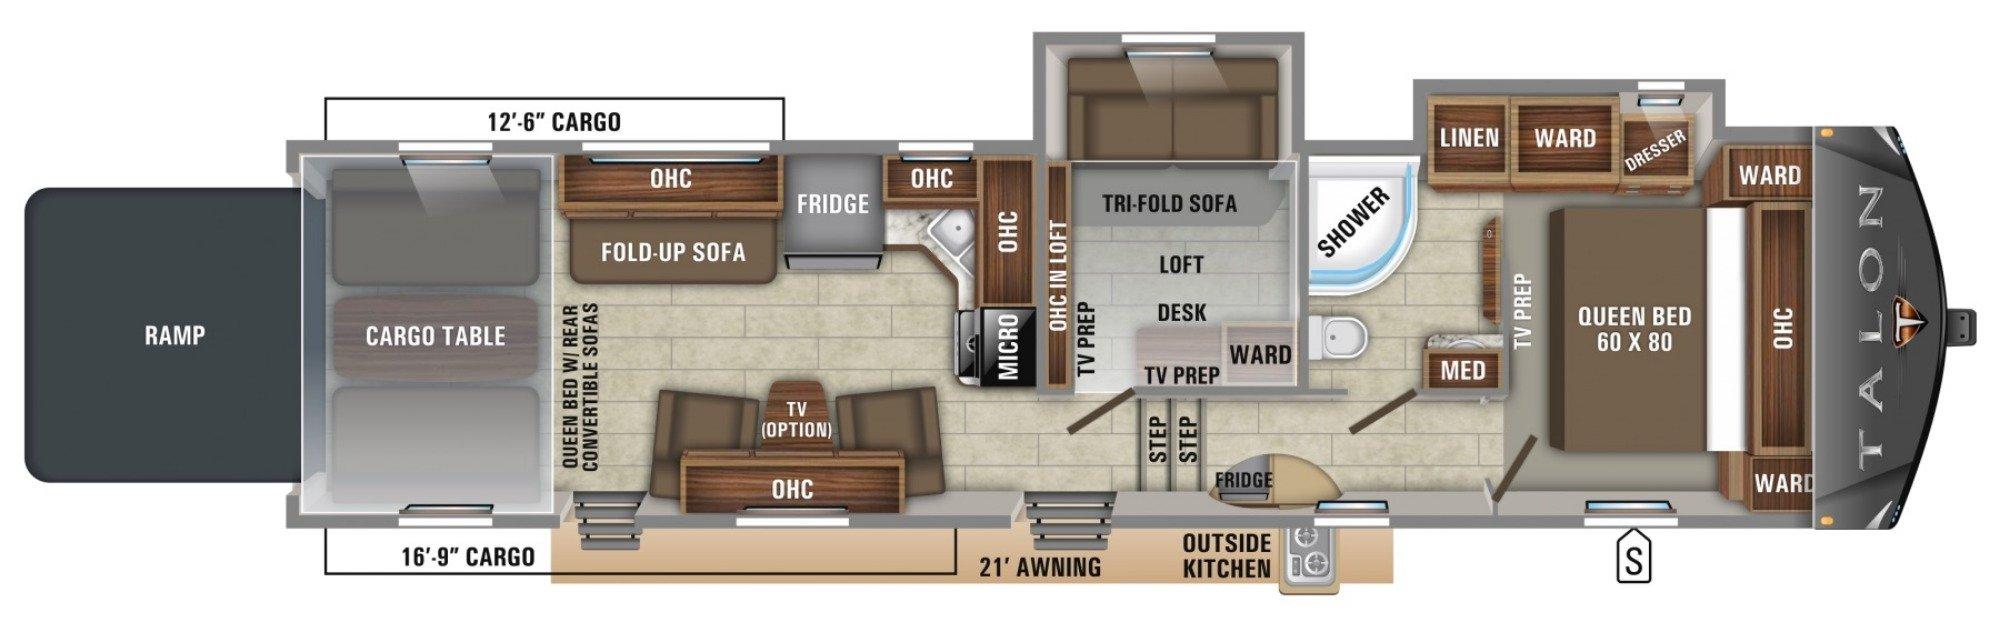 View Floor Plan for 2019 JAYCO TALON 392T